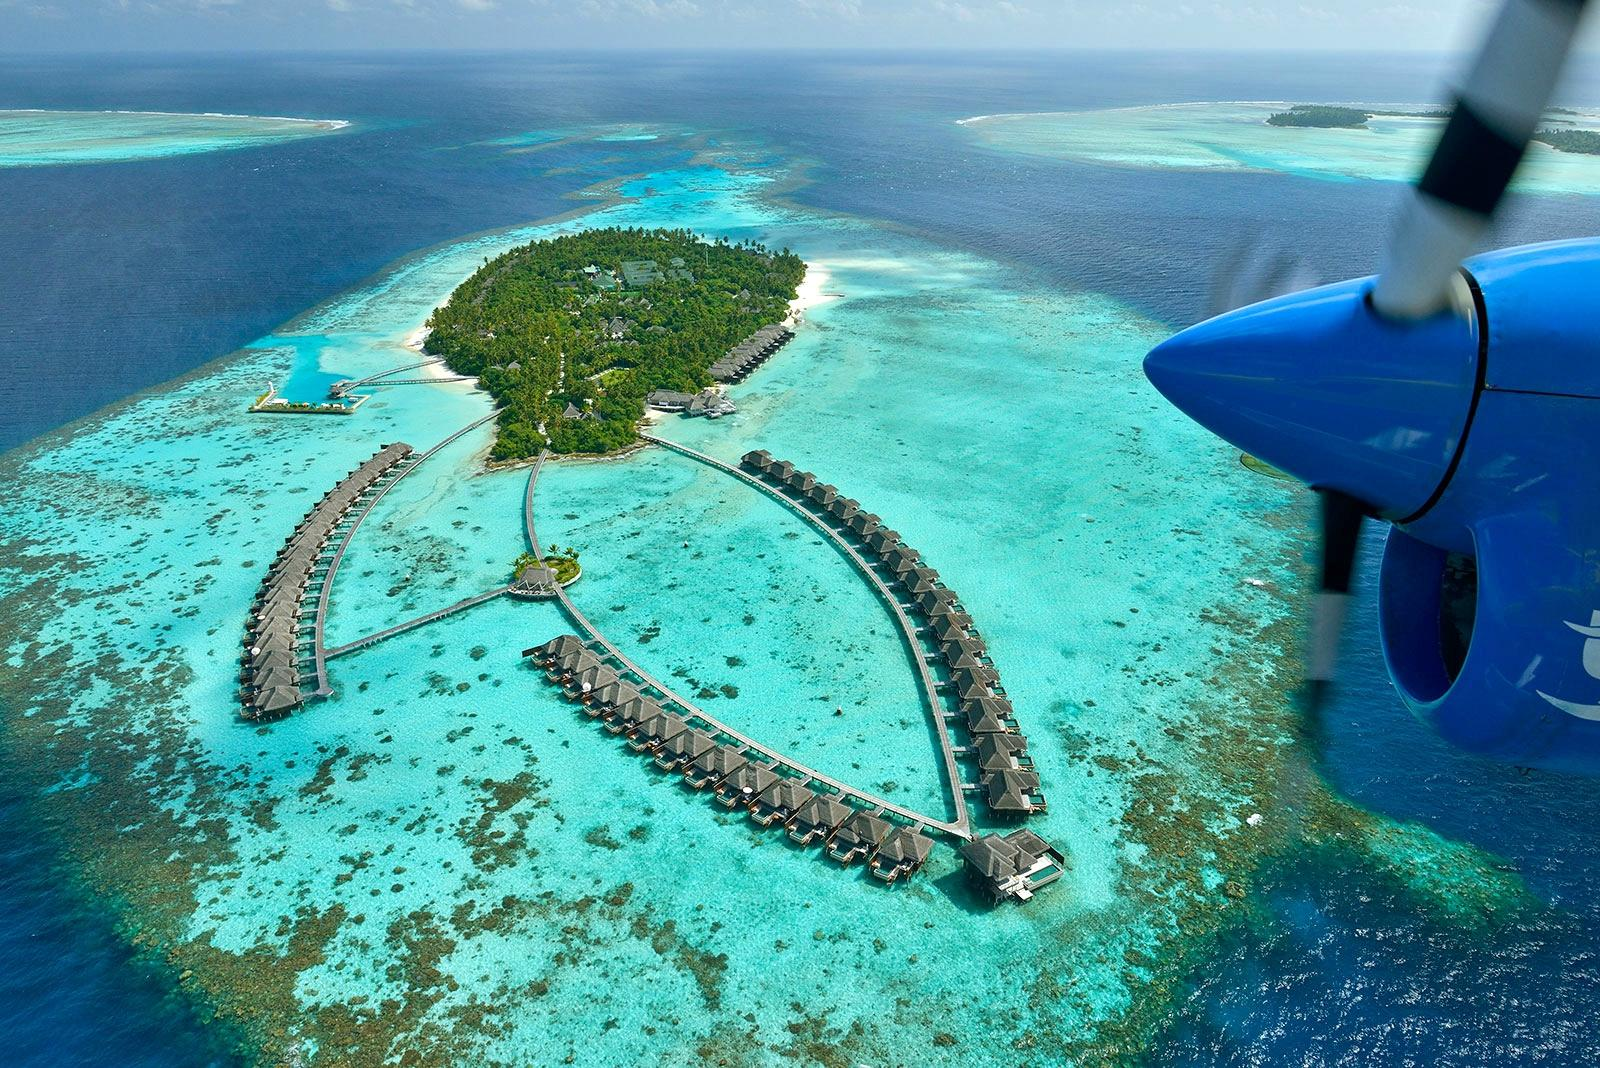 ZAP Wanderlust: Top 5 Reasons to Visit the Maldives — ZAPWATER